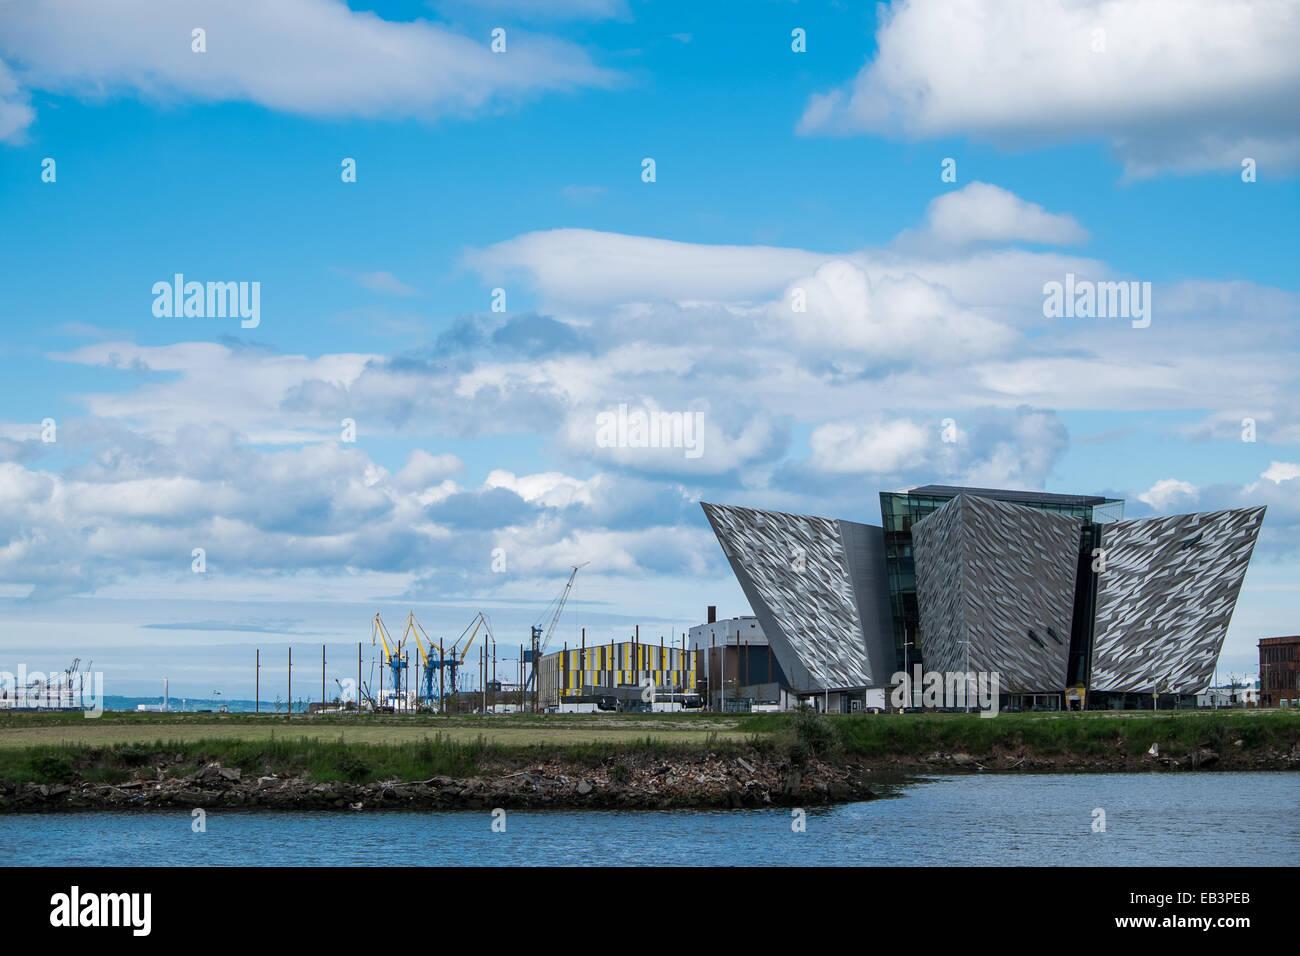 Titanic Museum in Belfast Northern Ireland - Stock Image